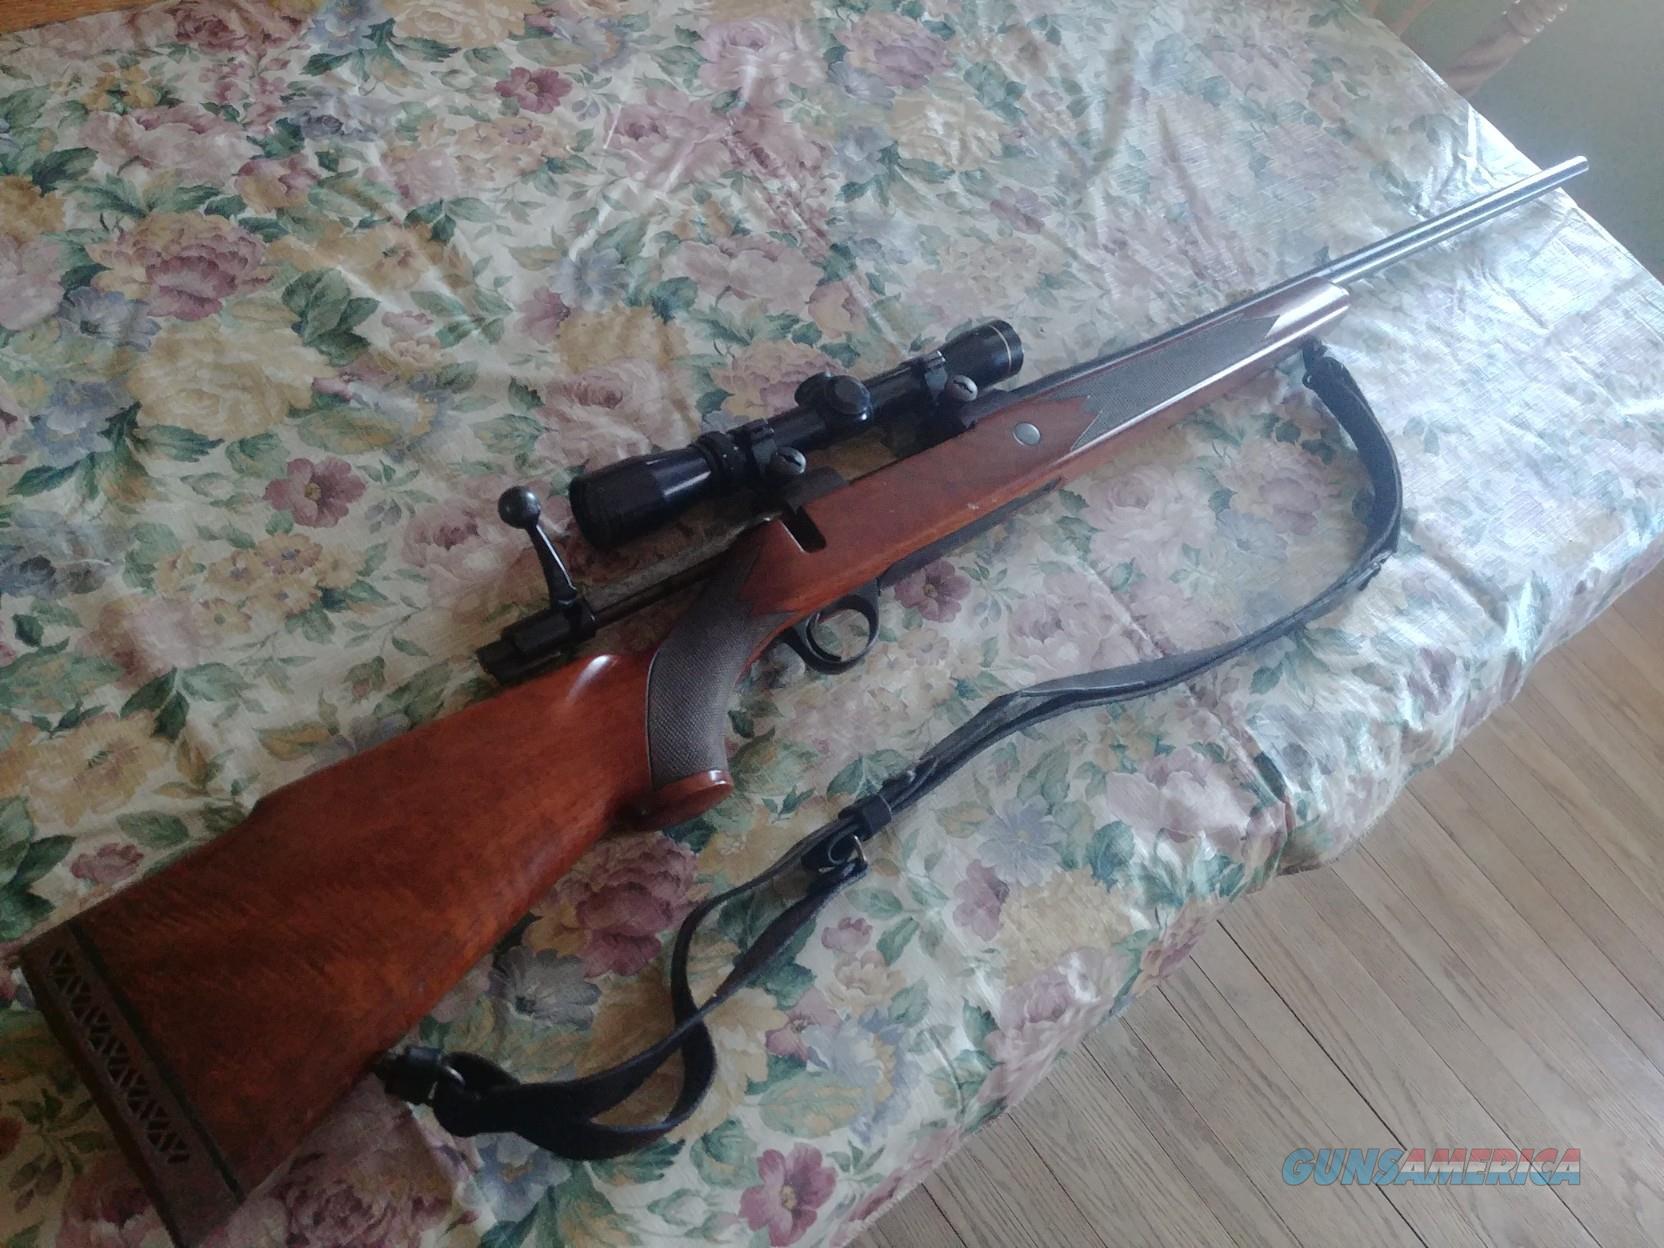 Sako Finnbear .30-06 + Leupold Scope  Guns > Rifles > Sako Rifles > Other Bolt Action